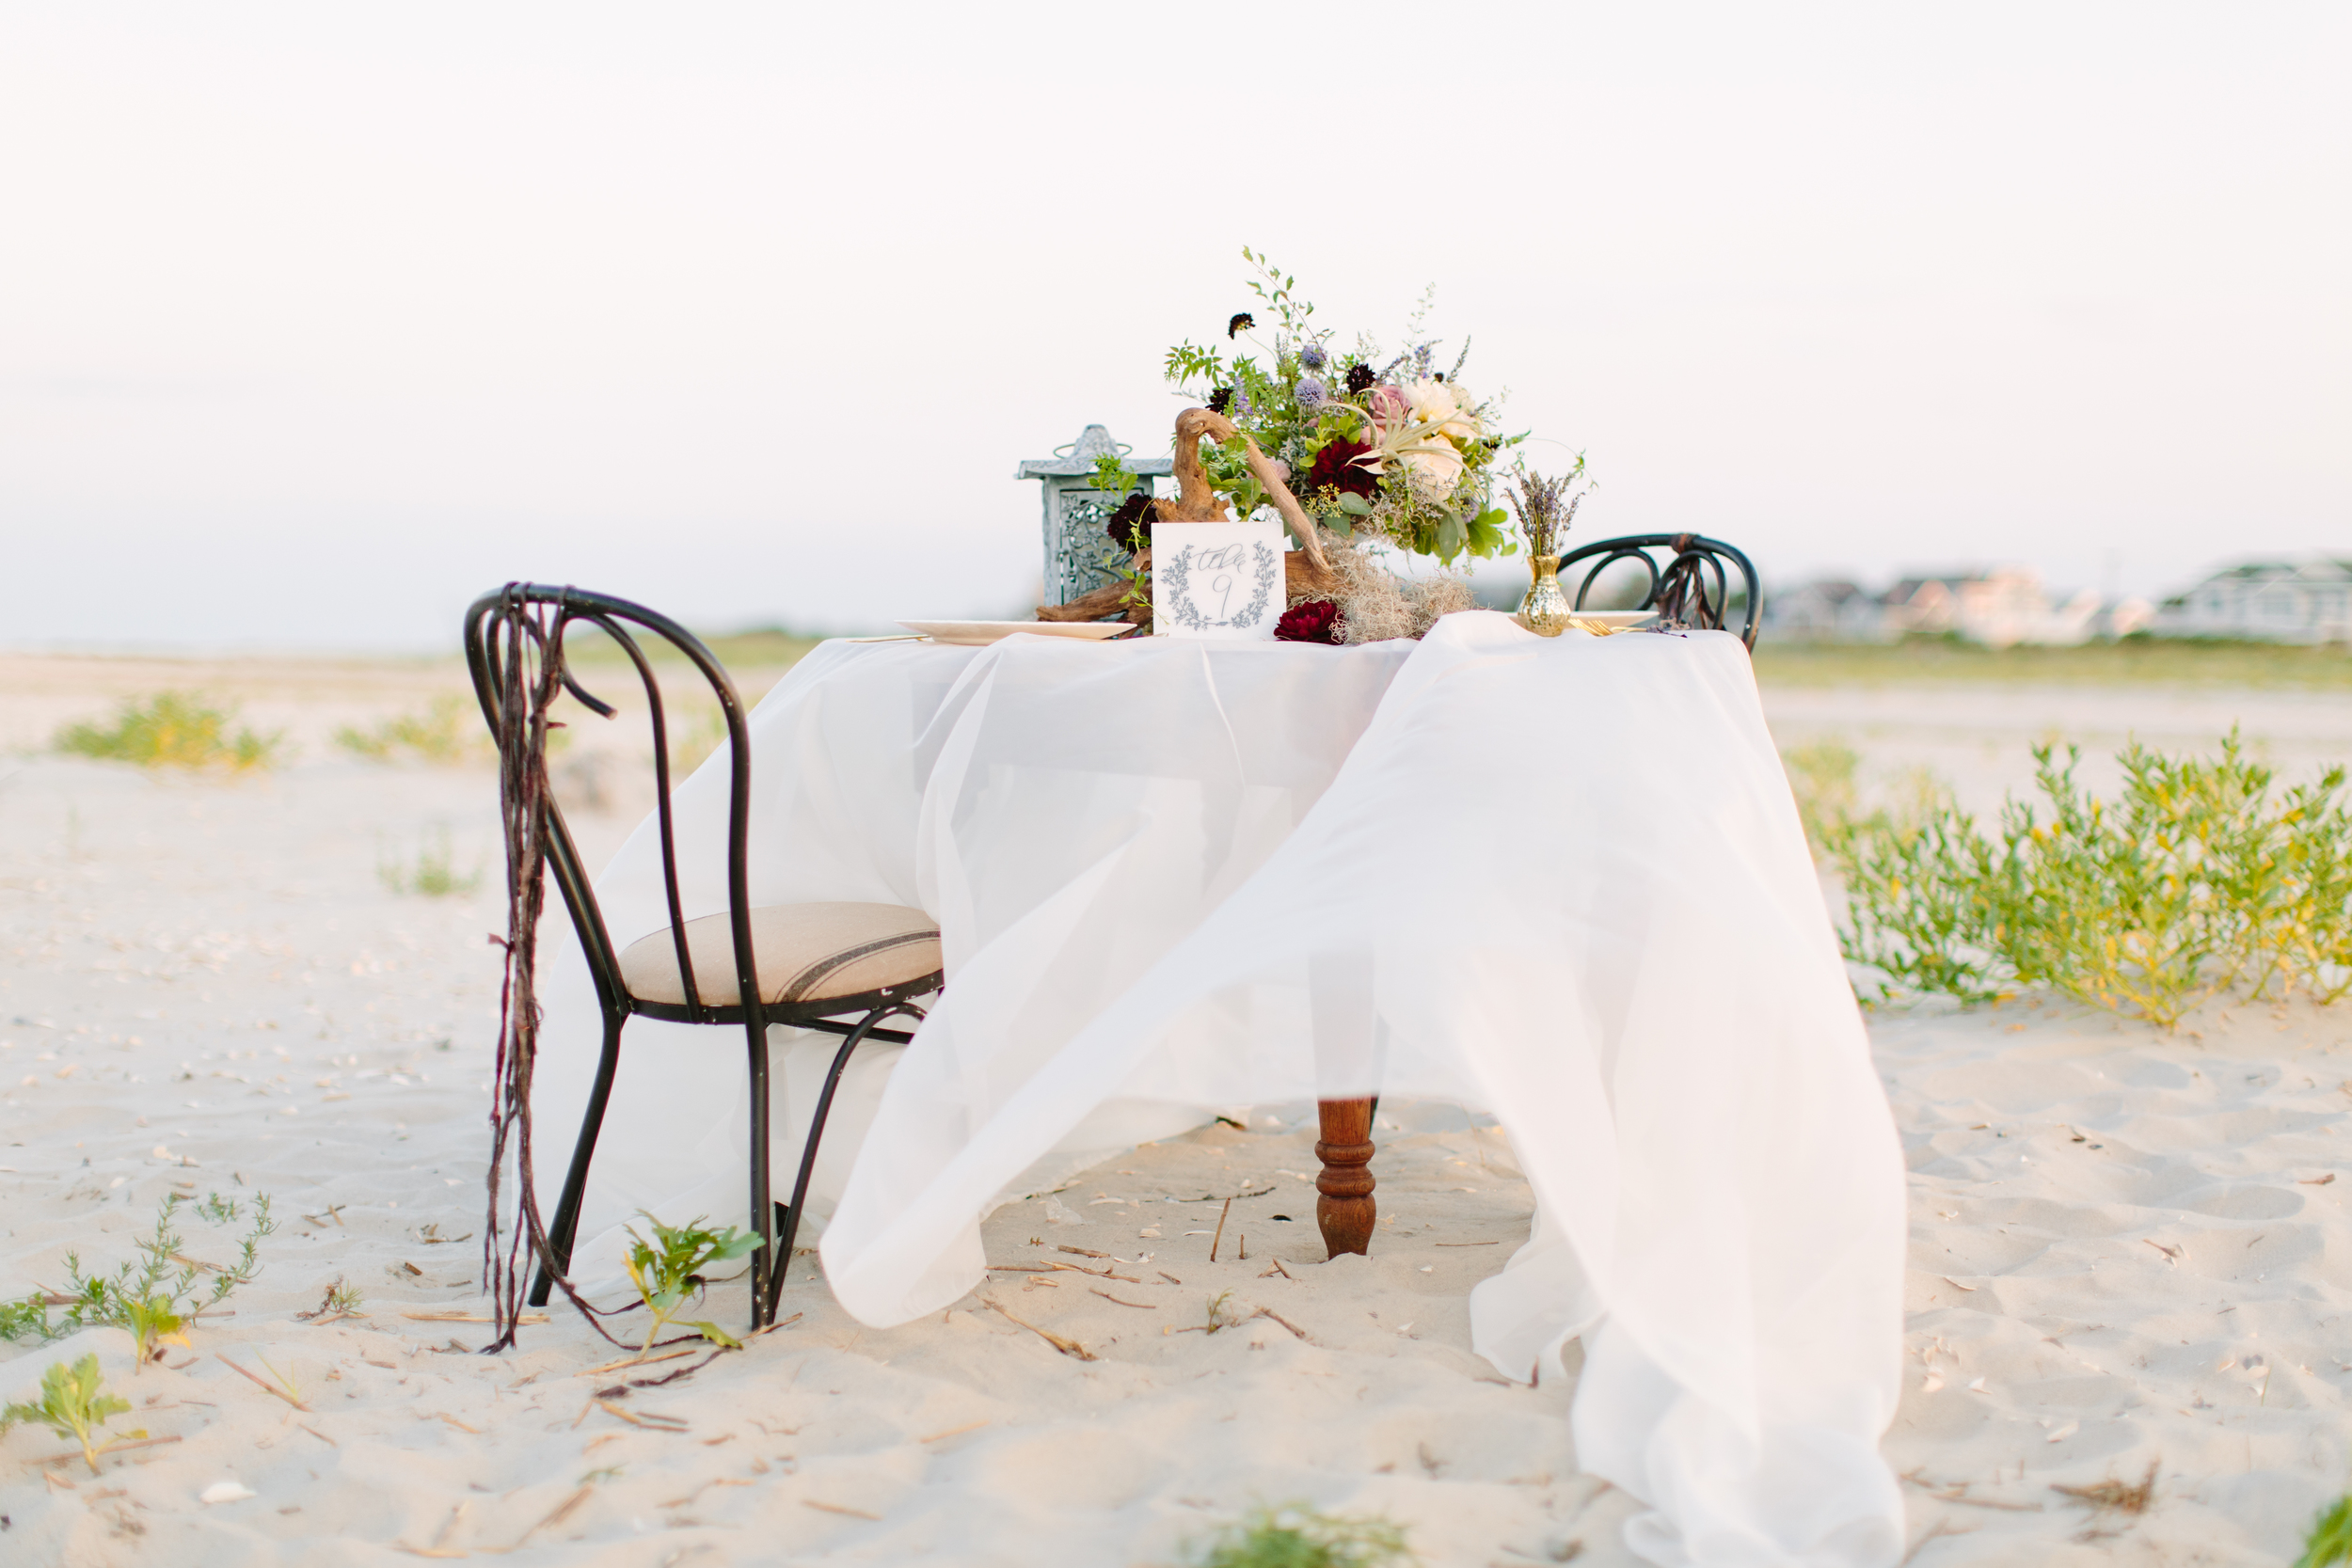 New-Jersey-Wedding-Photographer_Jessica-Cooper-Photography-68.jpg